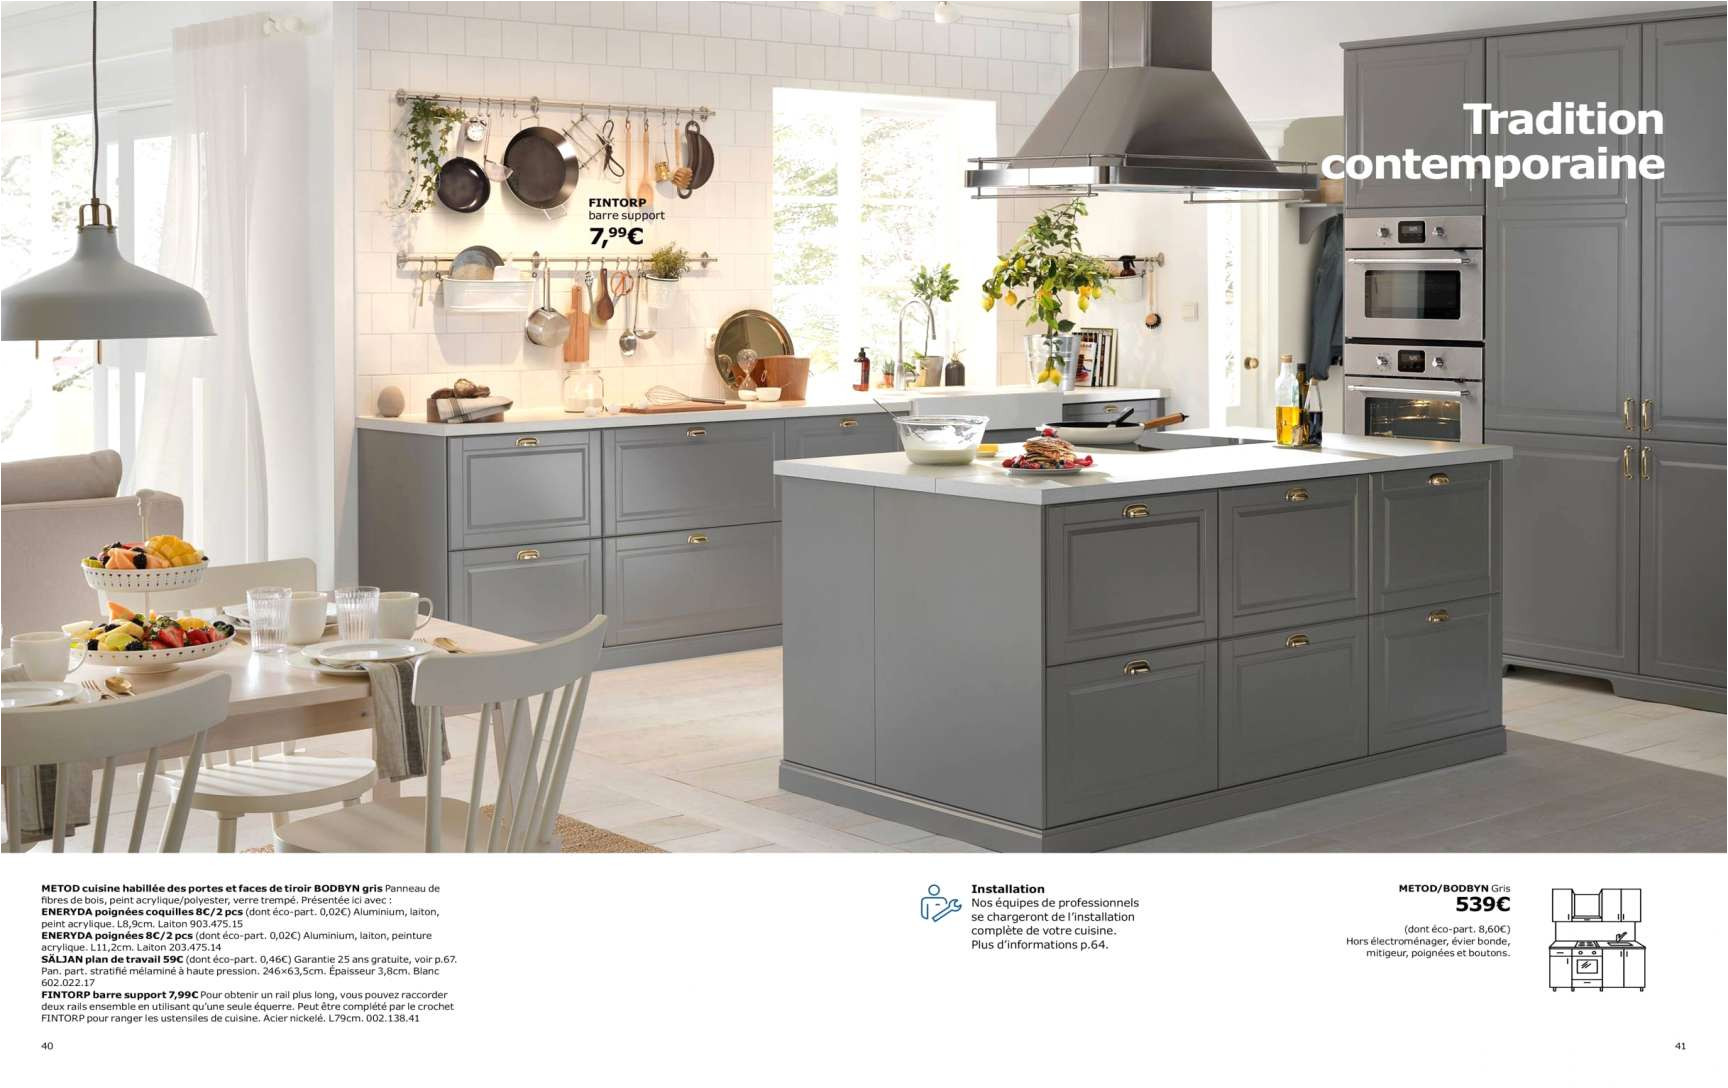 Ikea Cover Panel for Dishwasher Ikea Dishwasher Panel Plus Best Ikea Laundry Home Design Interior